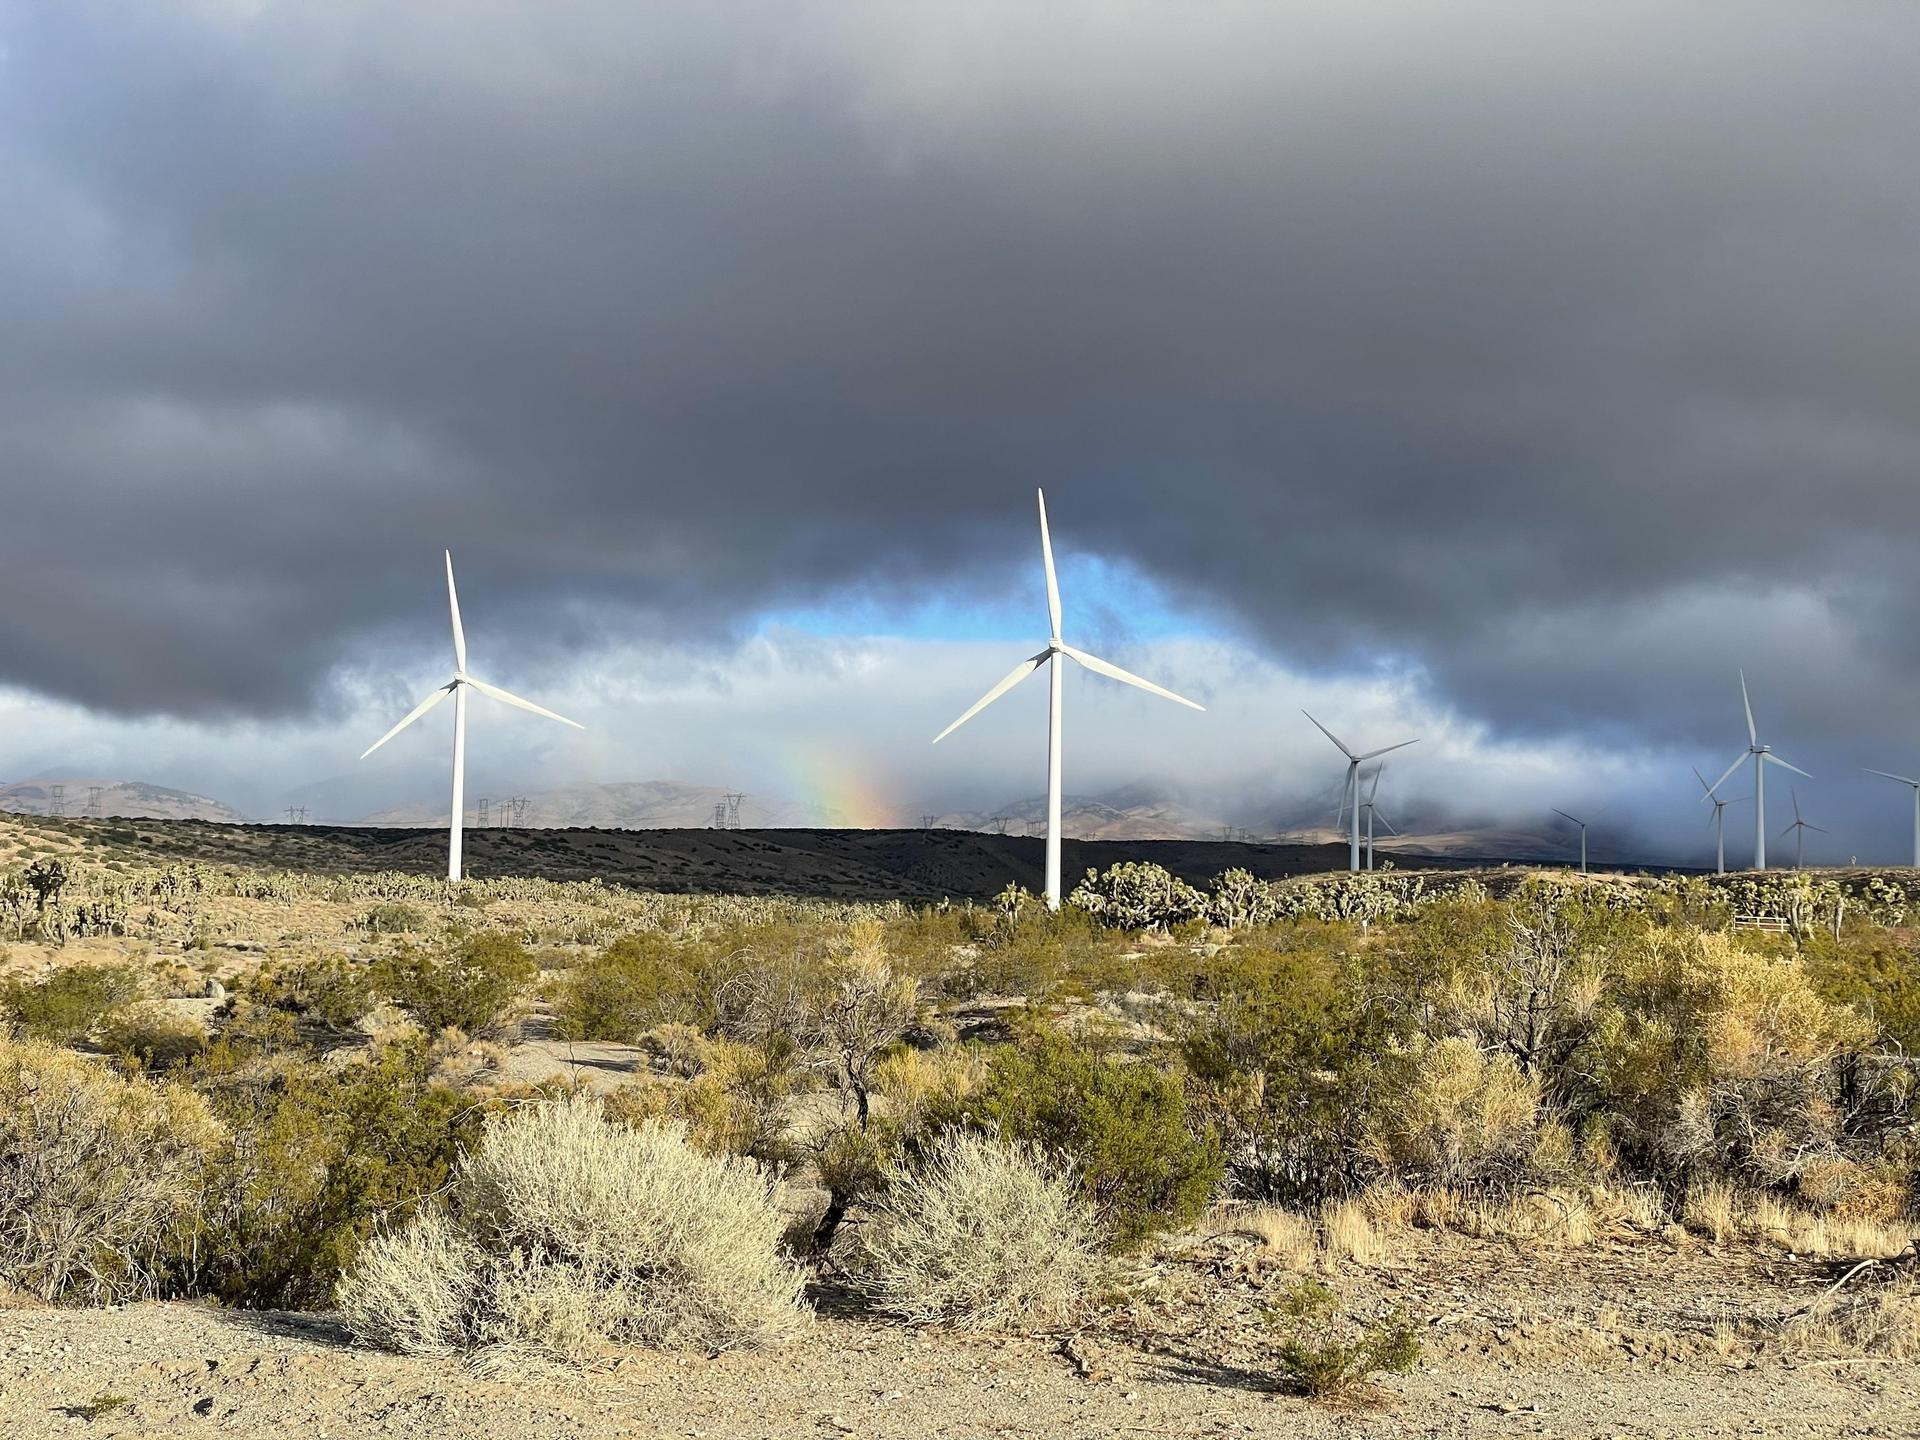 Rainbows and windmills